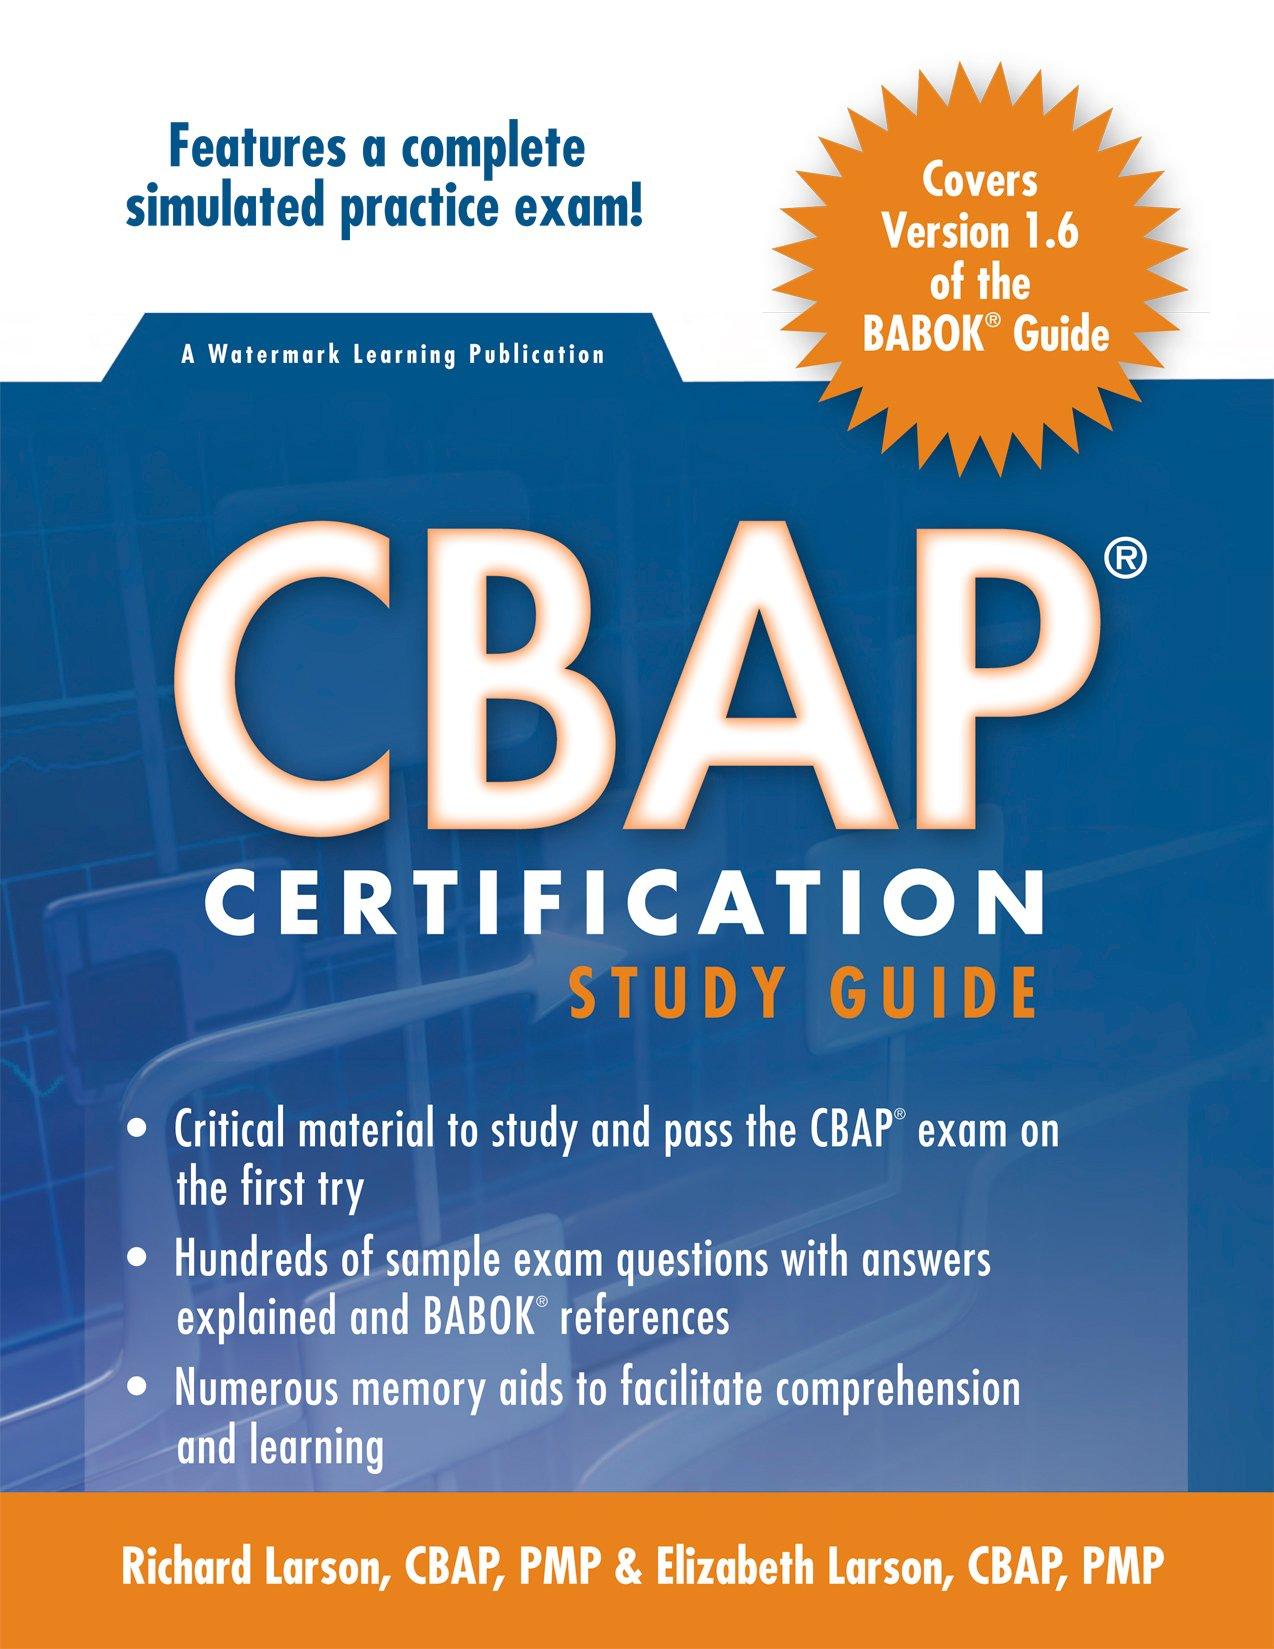 CBAP Certification Study Guide v1 6: Richard Larson, Elizabeth